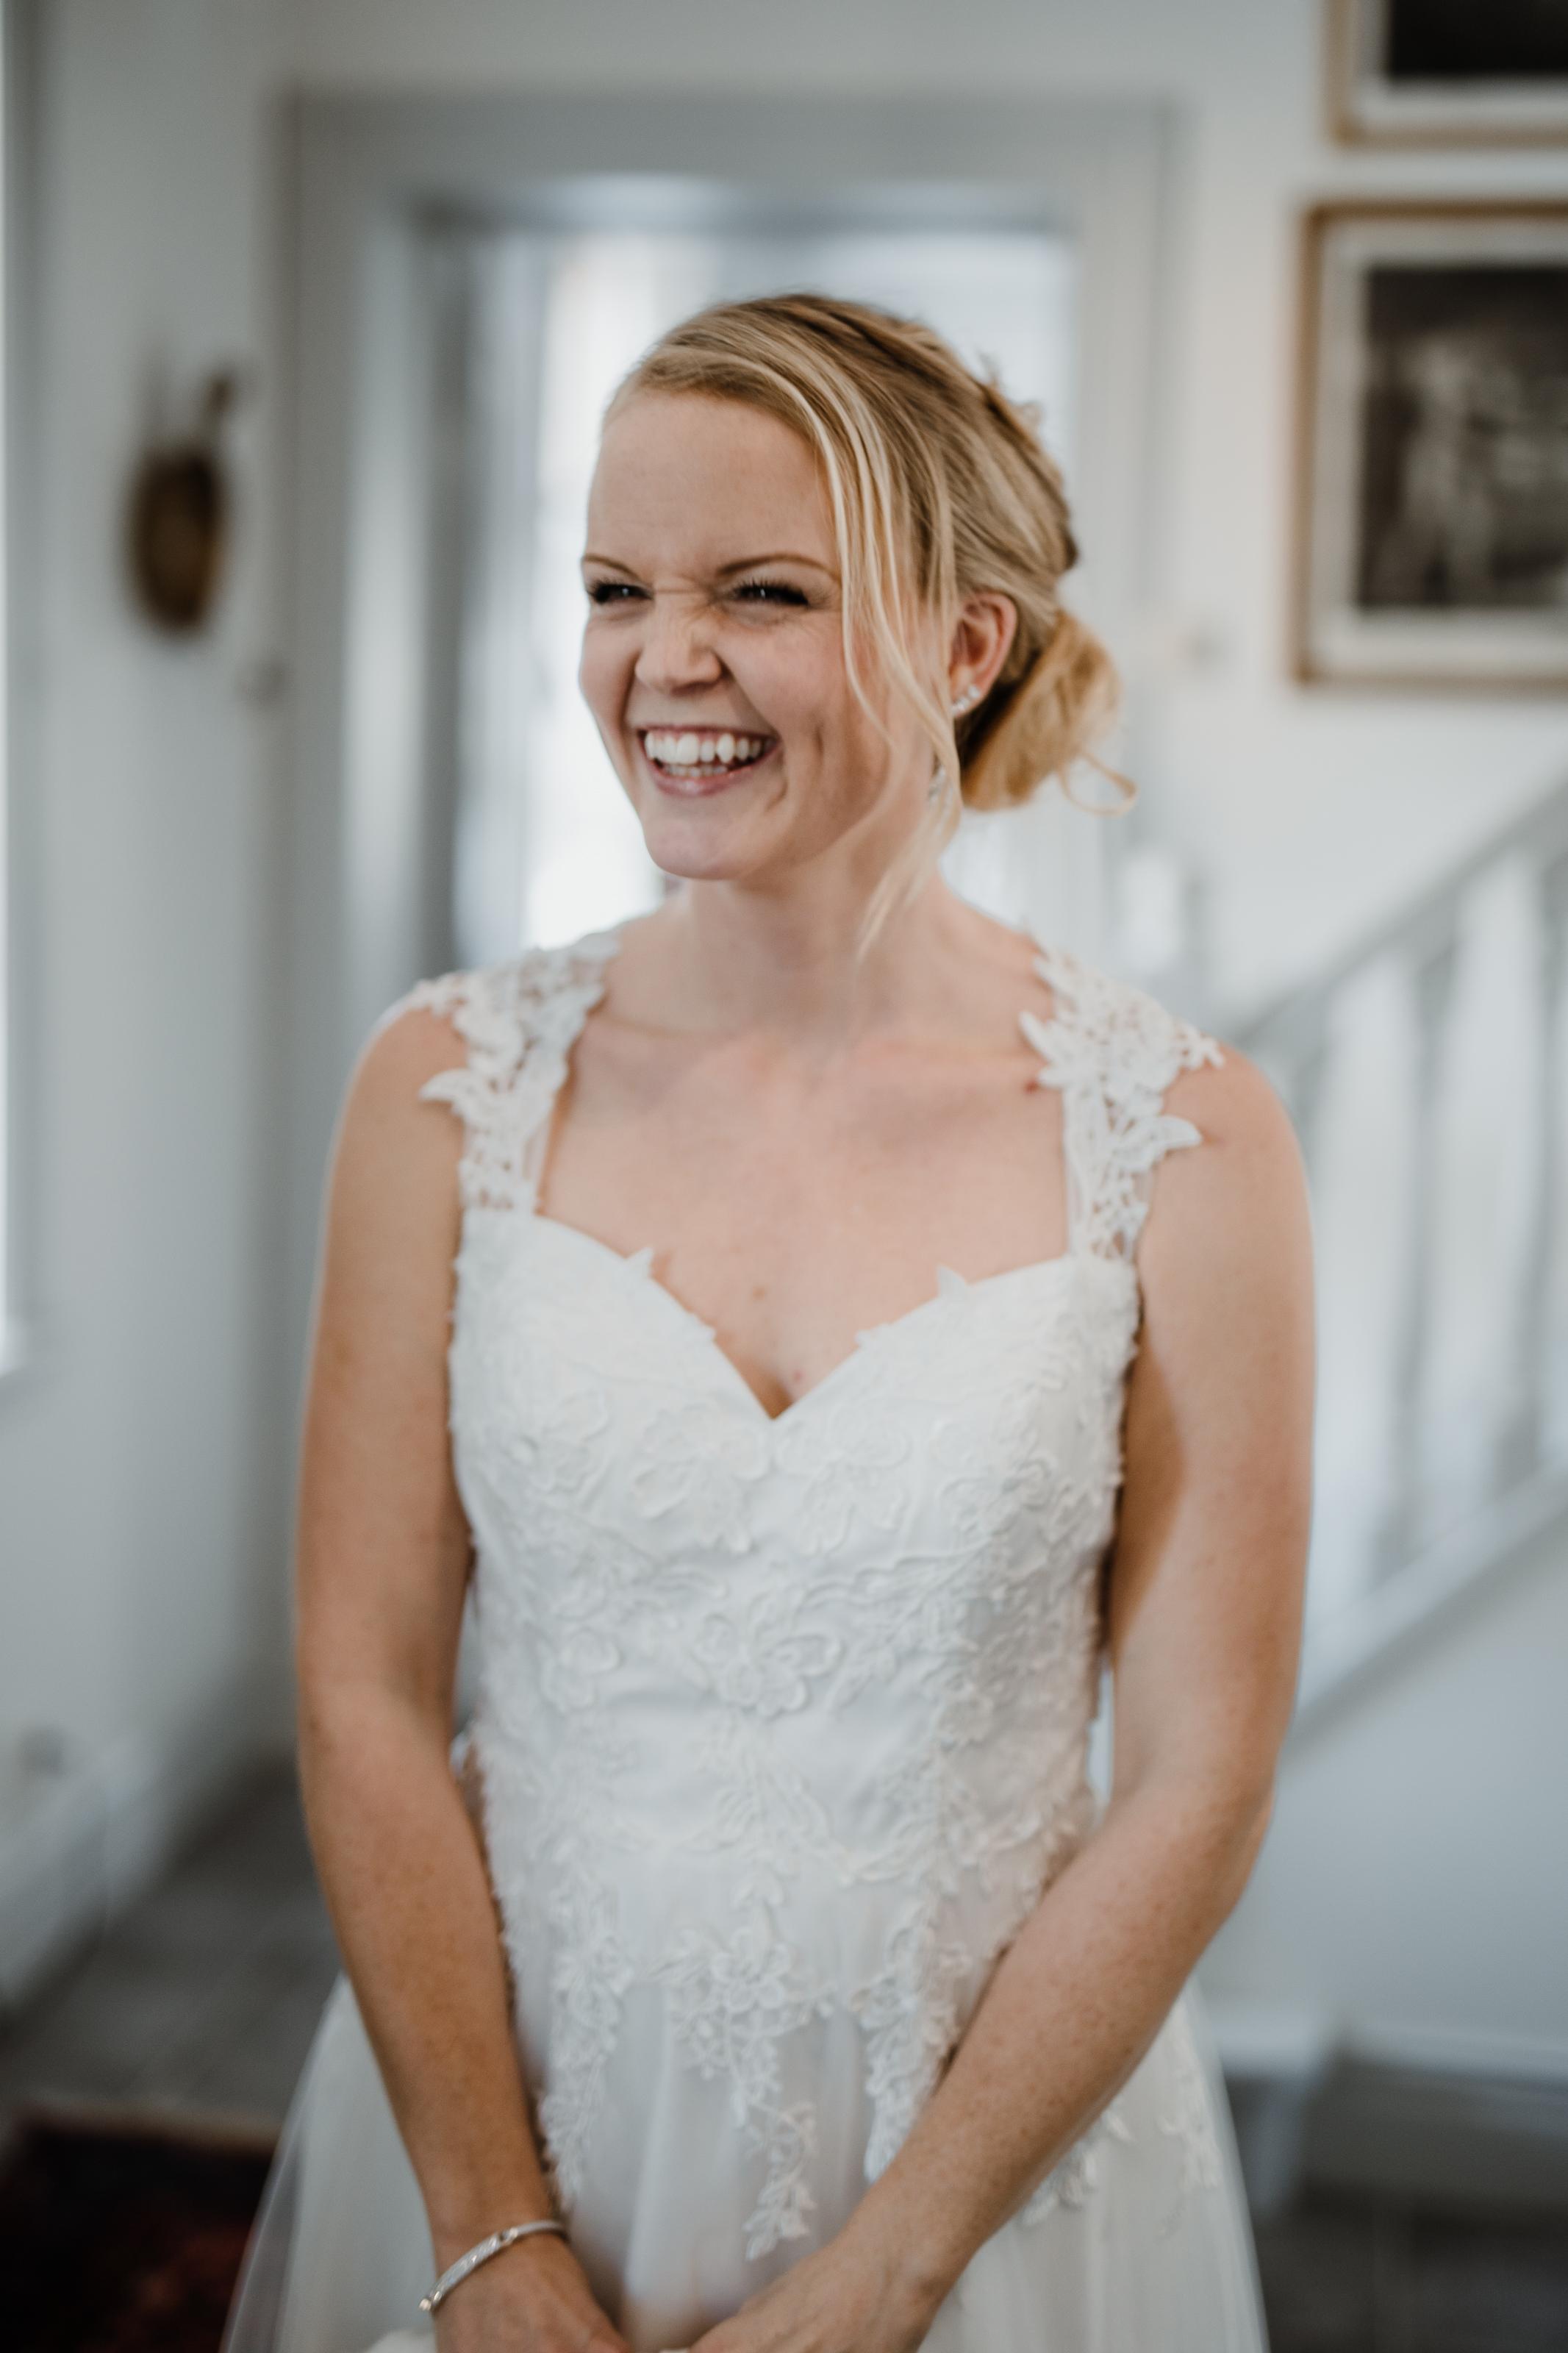 Bröllopsfotograf-Uddetorp Säteri-Höstbröllop-Fotograf Emilia- Bröllopsfotograf Borås-13.jpg